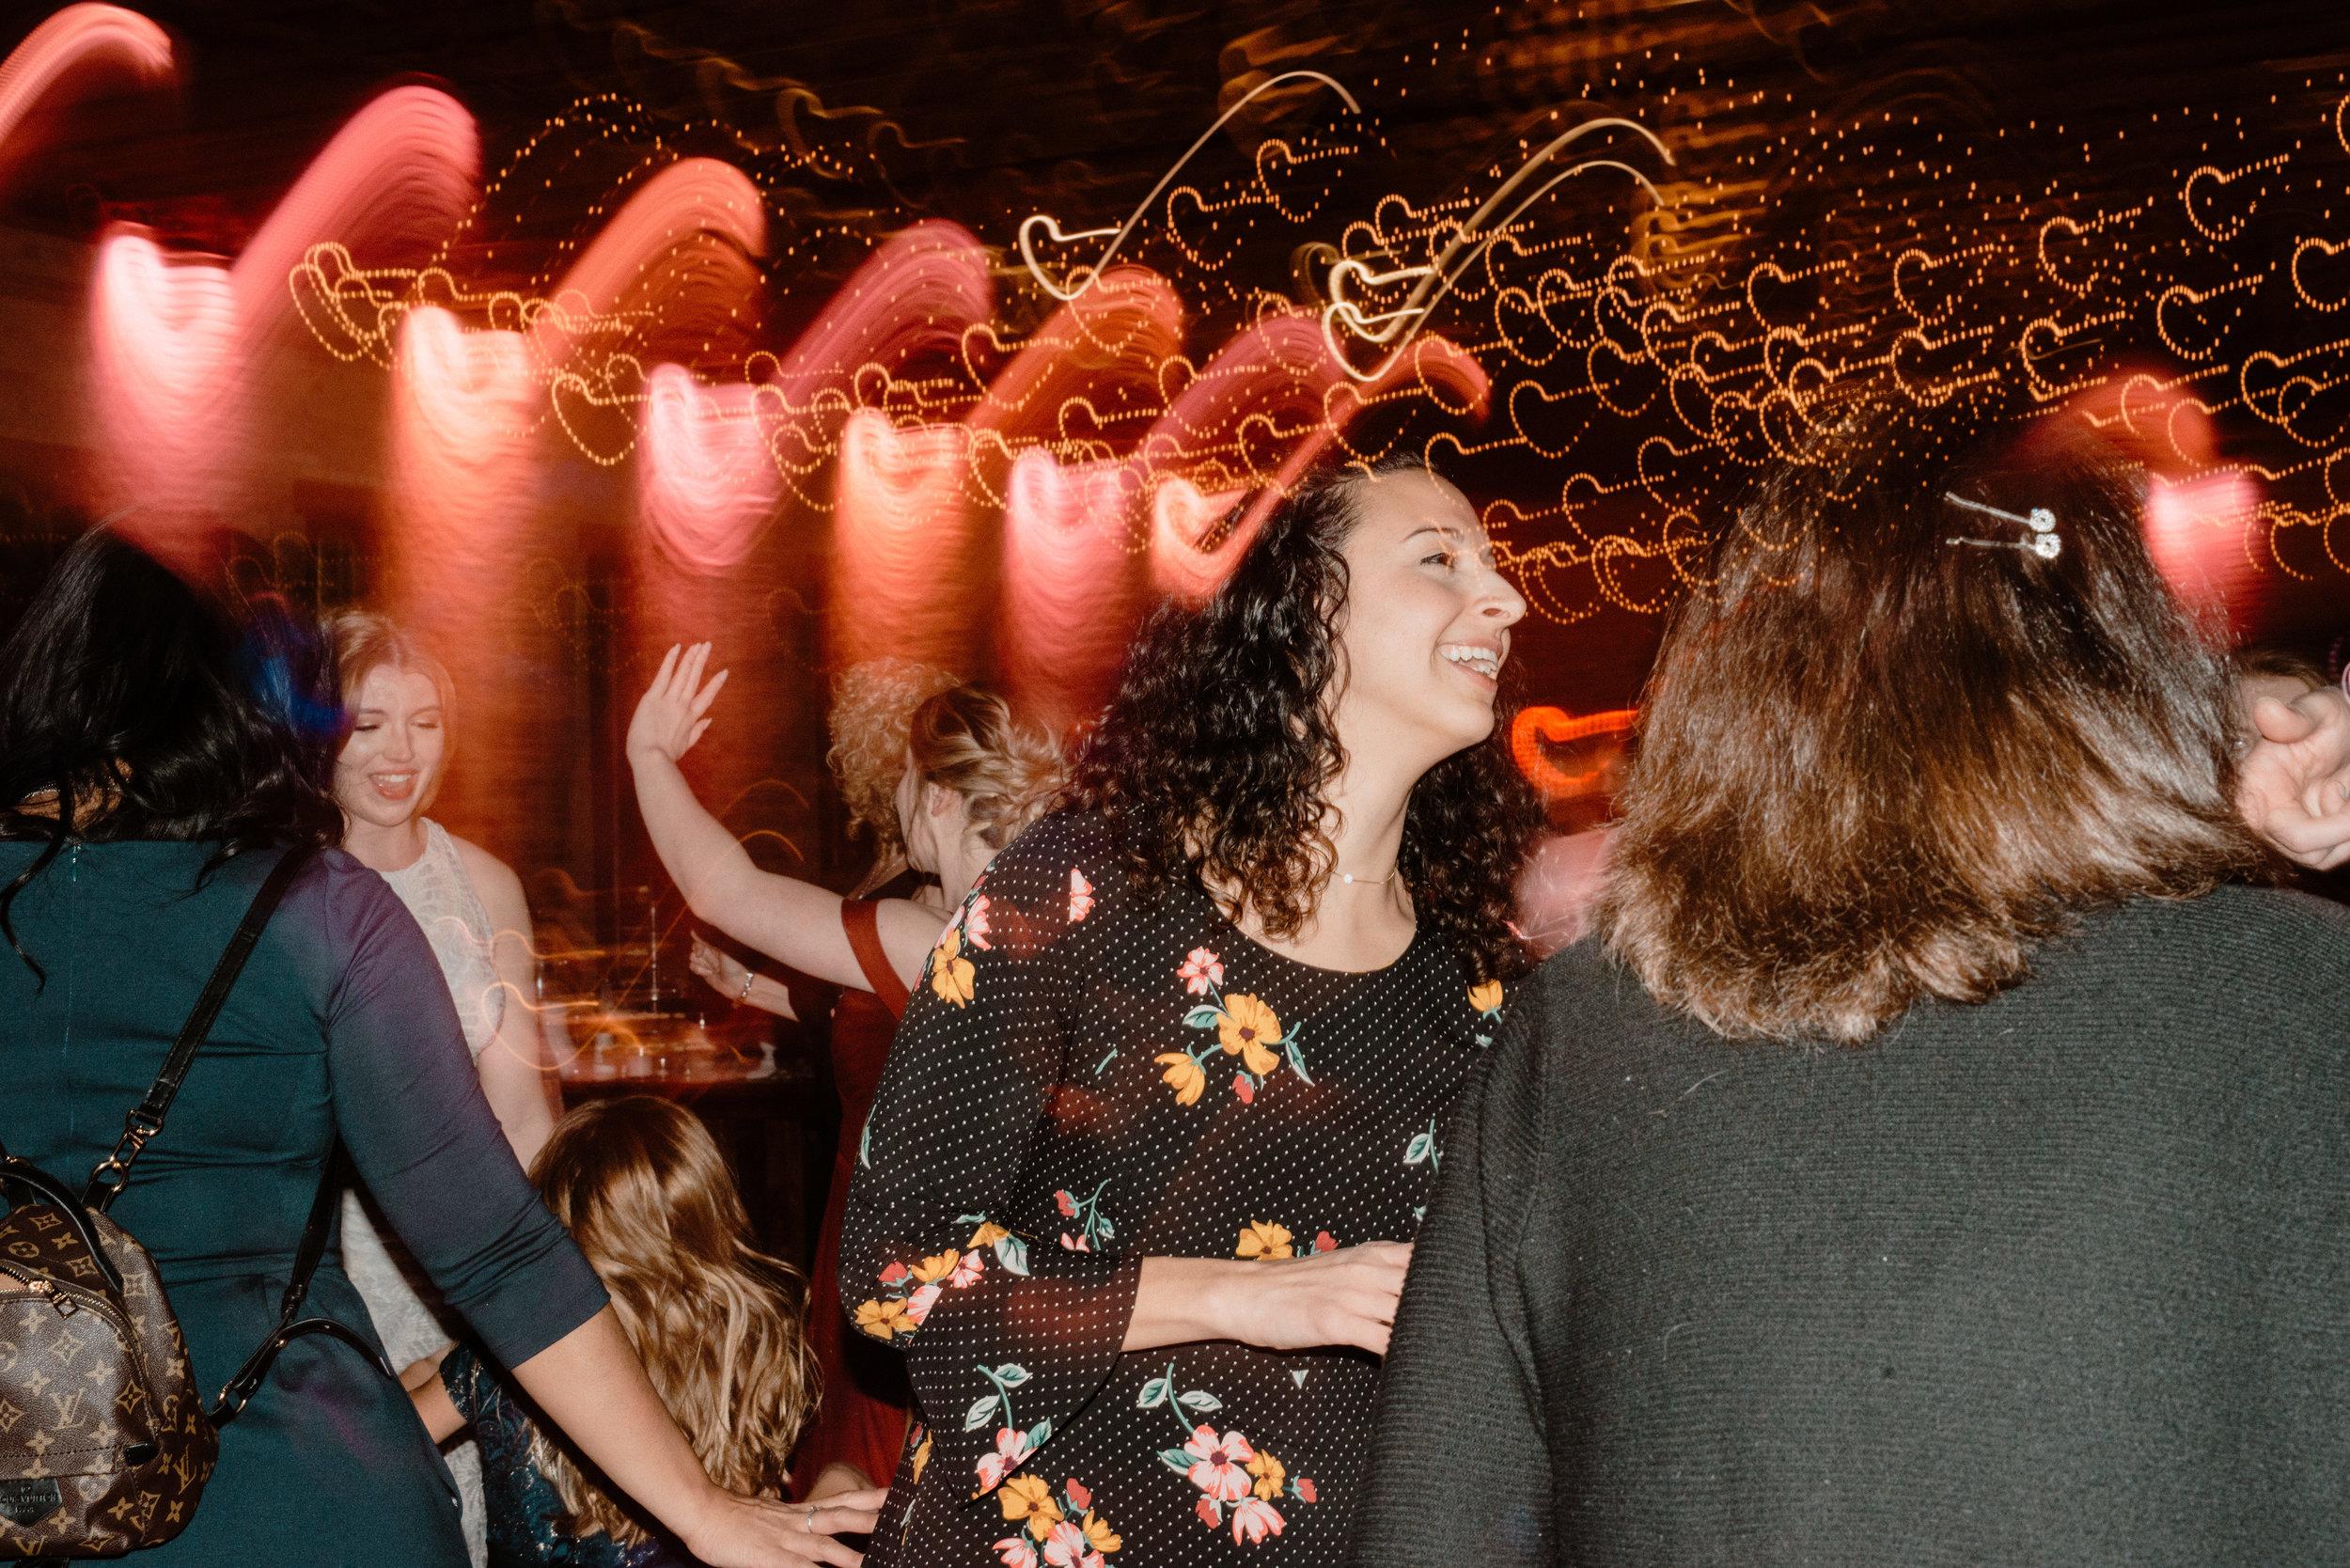 The Brix on Fox, Chicago Wedding Photographer, Zach and Rosalie00067.jpg